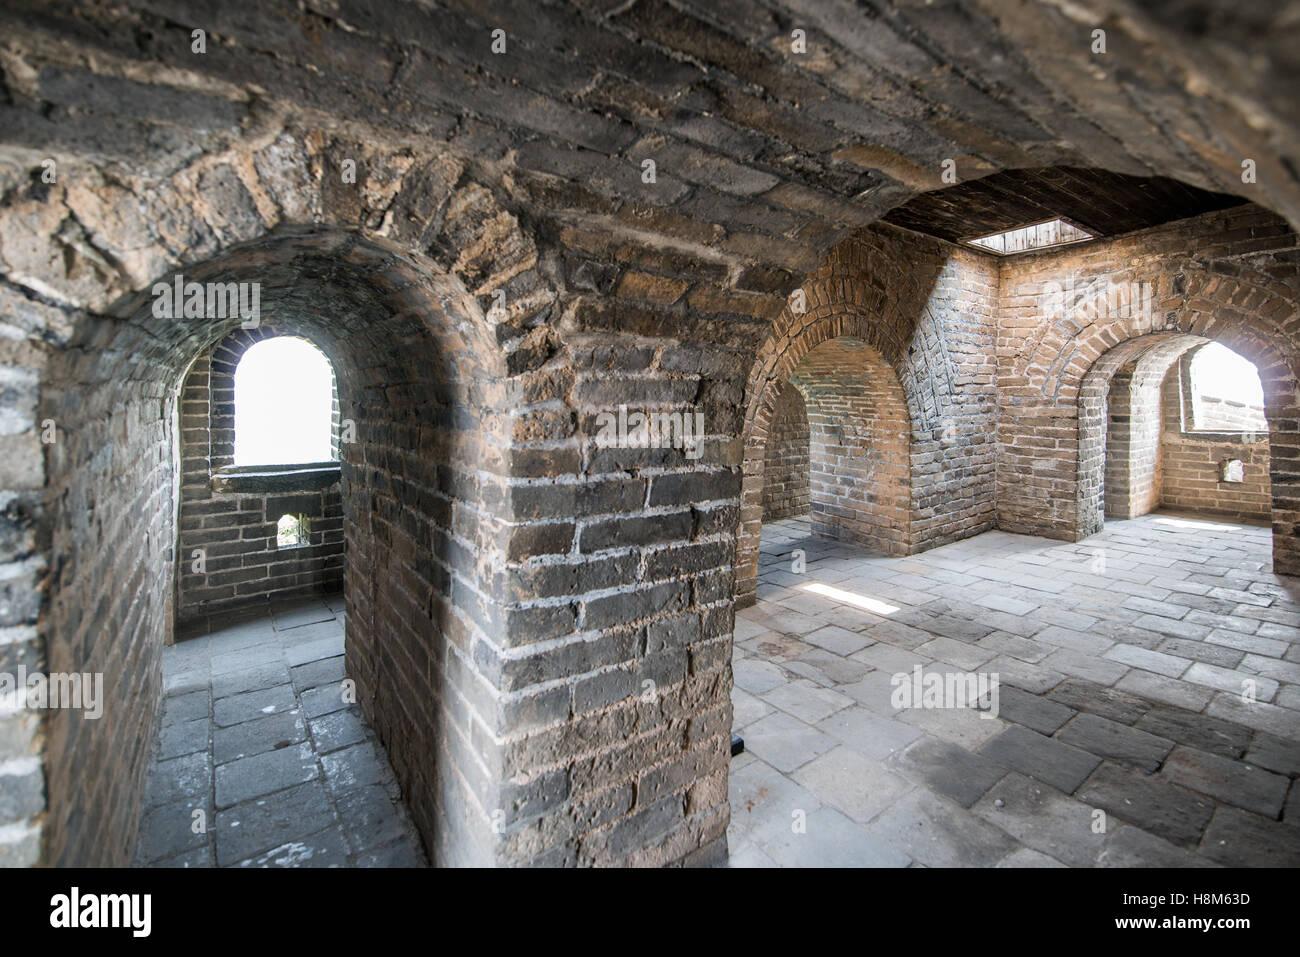 Mutianyu, China - Interieur der Great Wall Of China. Die Mauer erstreckt sich über 6.000 bergige Kilometer Stockbild